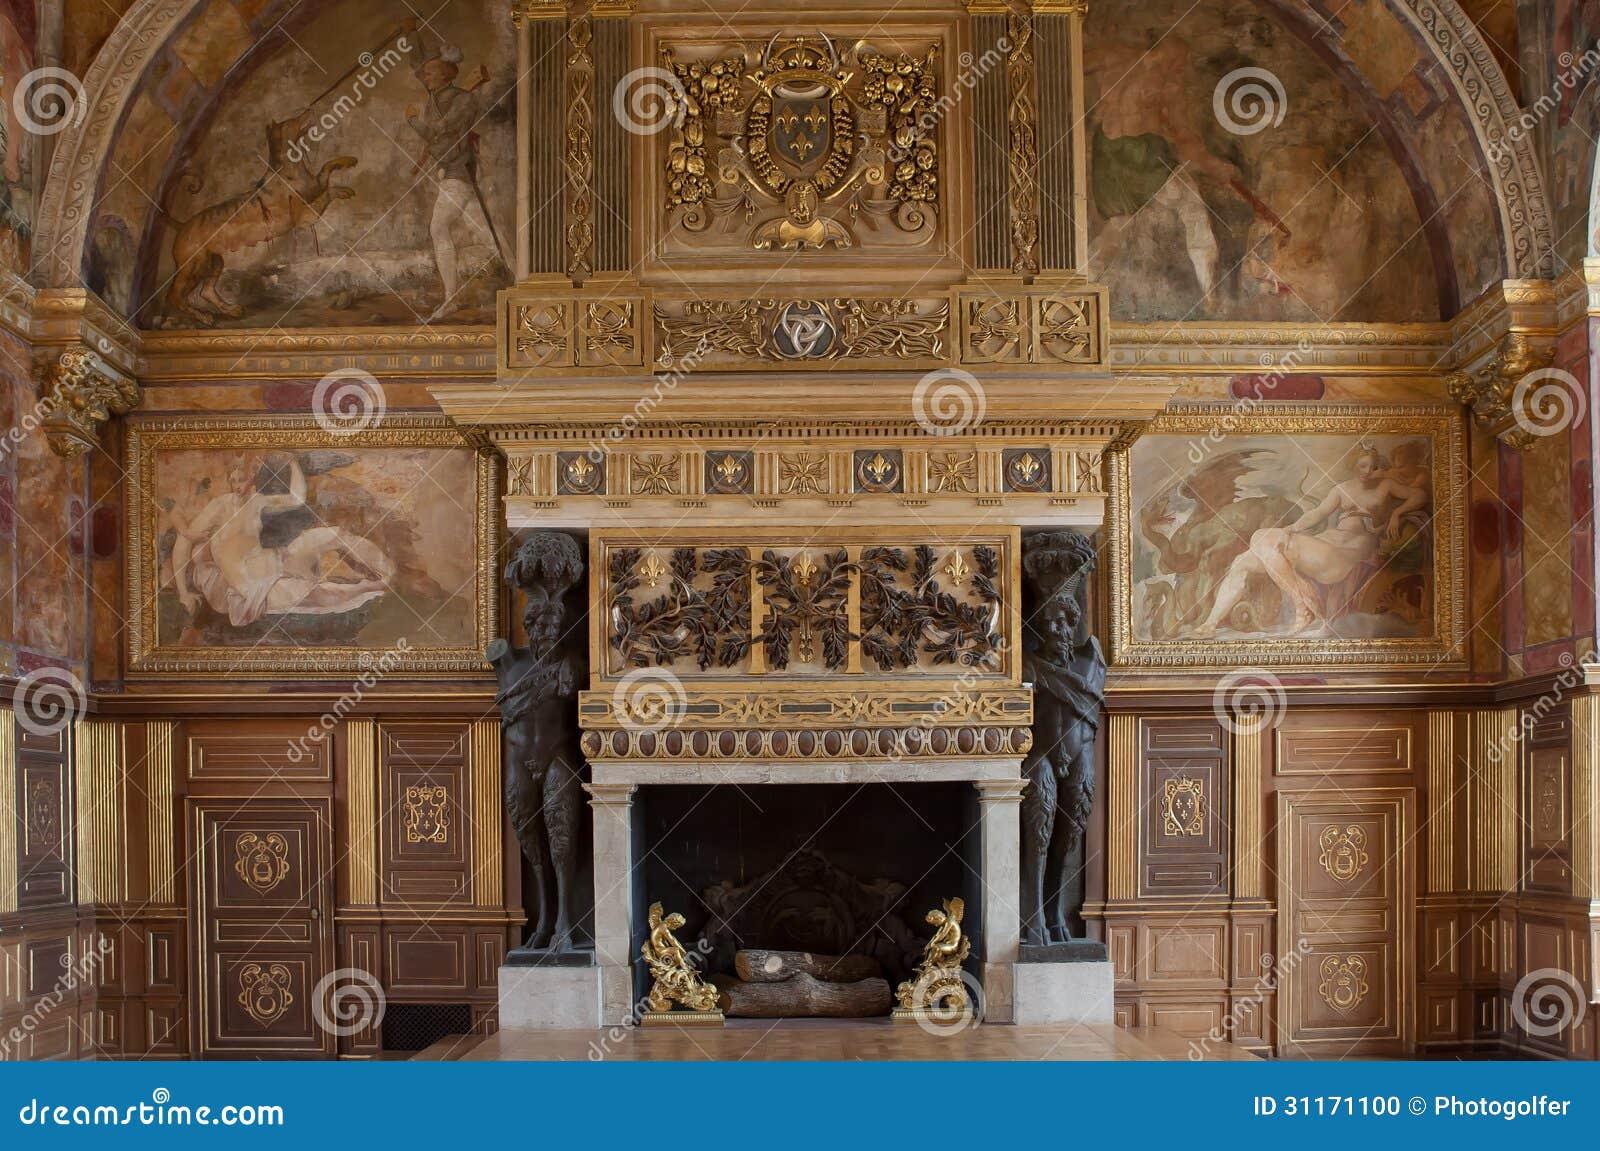 chateau de fontainebleau france interiors details editorial image image 31171100. Black Bedroom Furniture Sets. Home Design Ideas